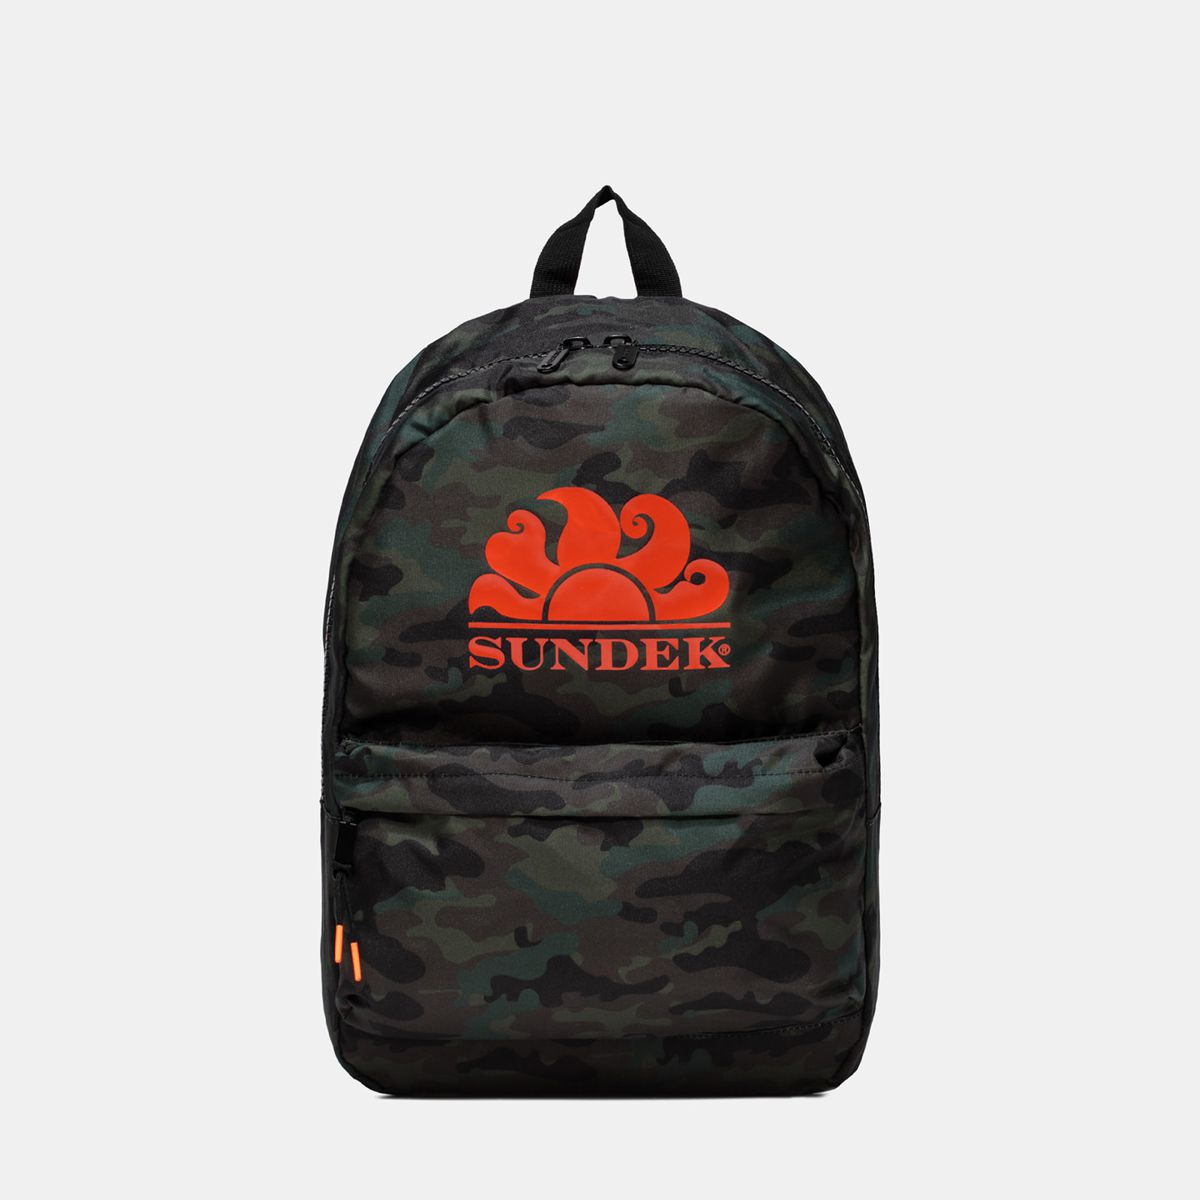 1. Camouflage back pack Deep forest 2 Sundek